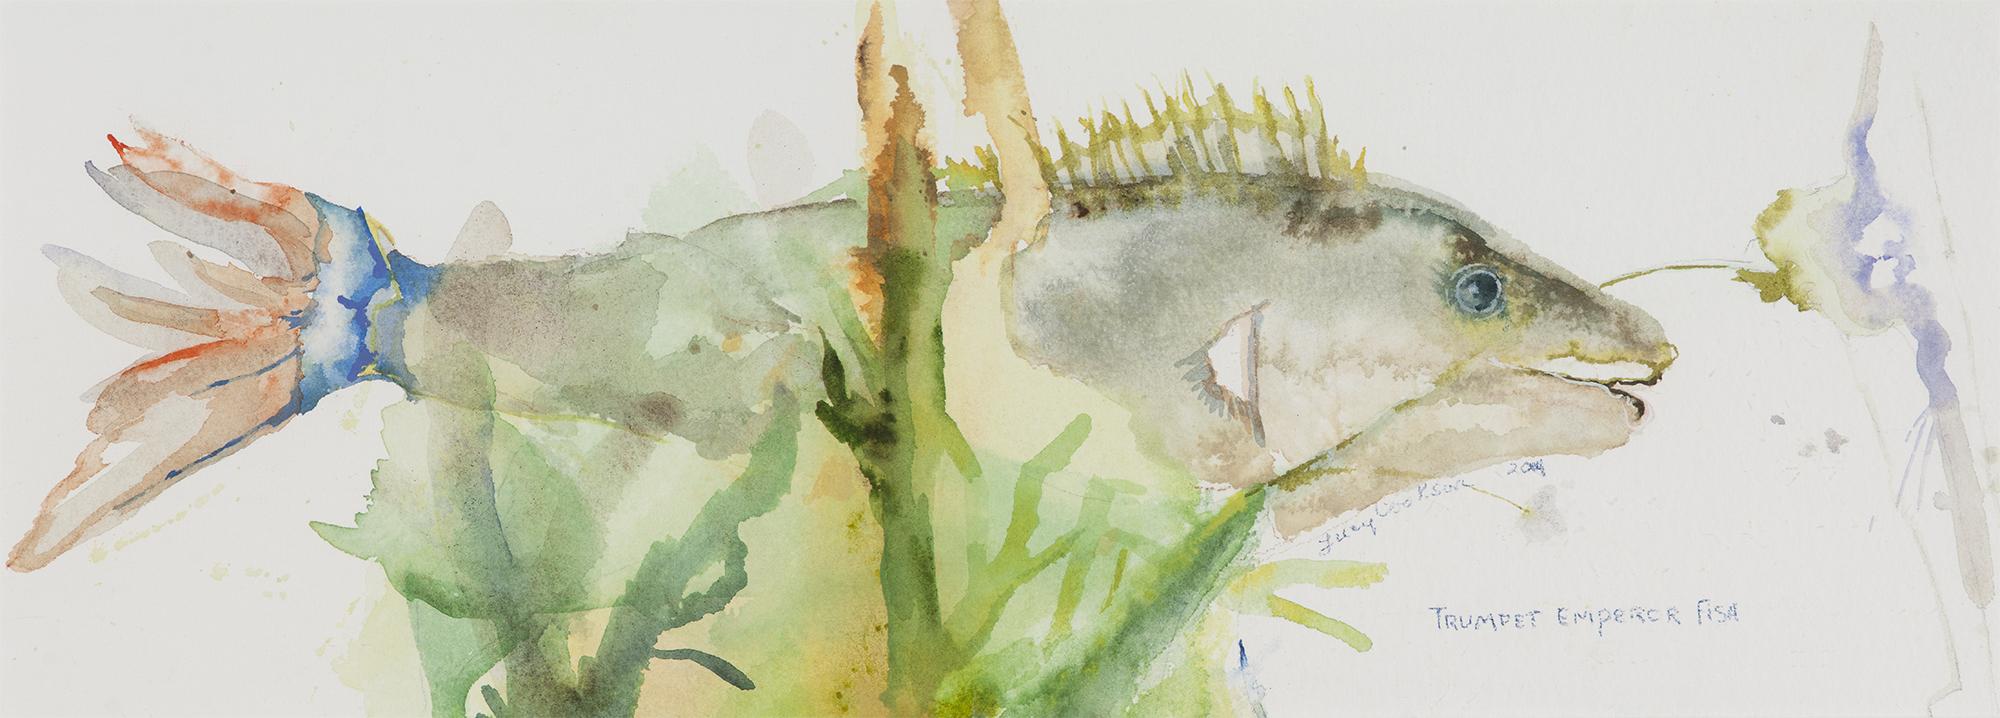 Trumpet Emperor Fish, 2014, Watercolor on paper, 18 x 30 in.